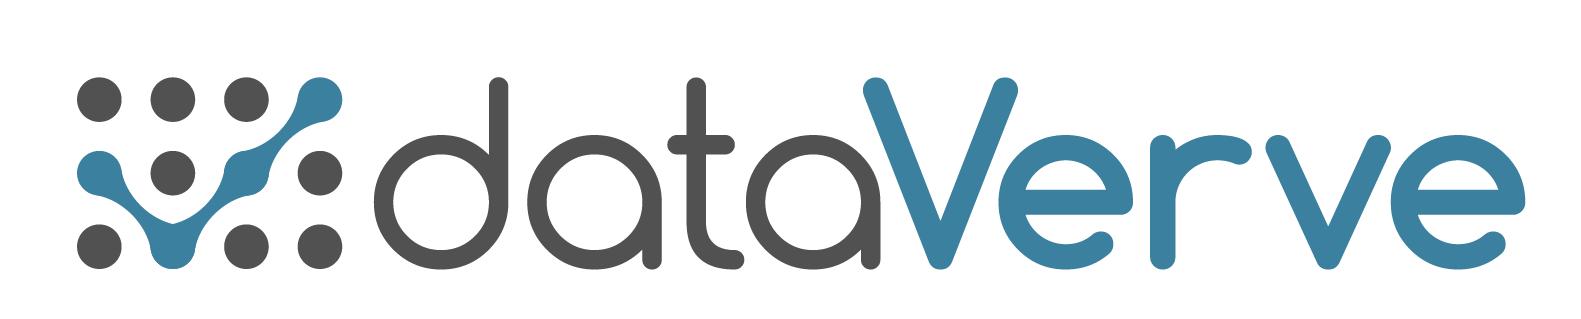 dataverve logo v02